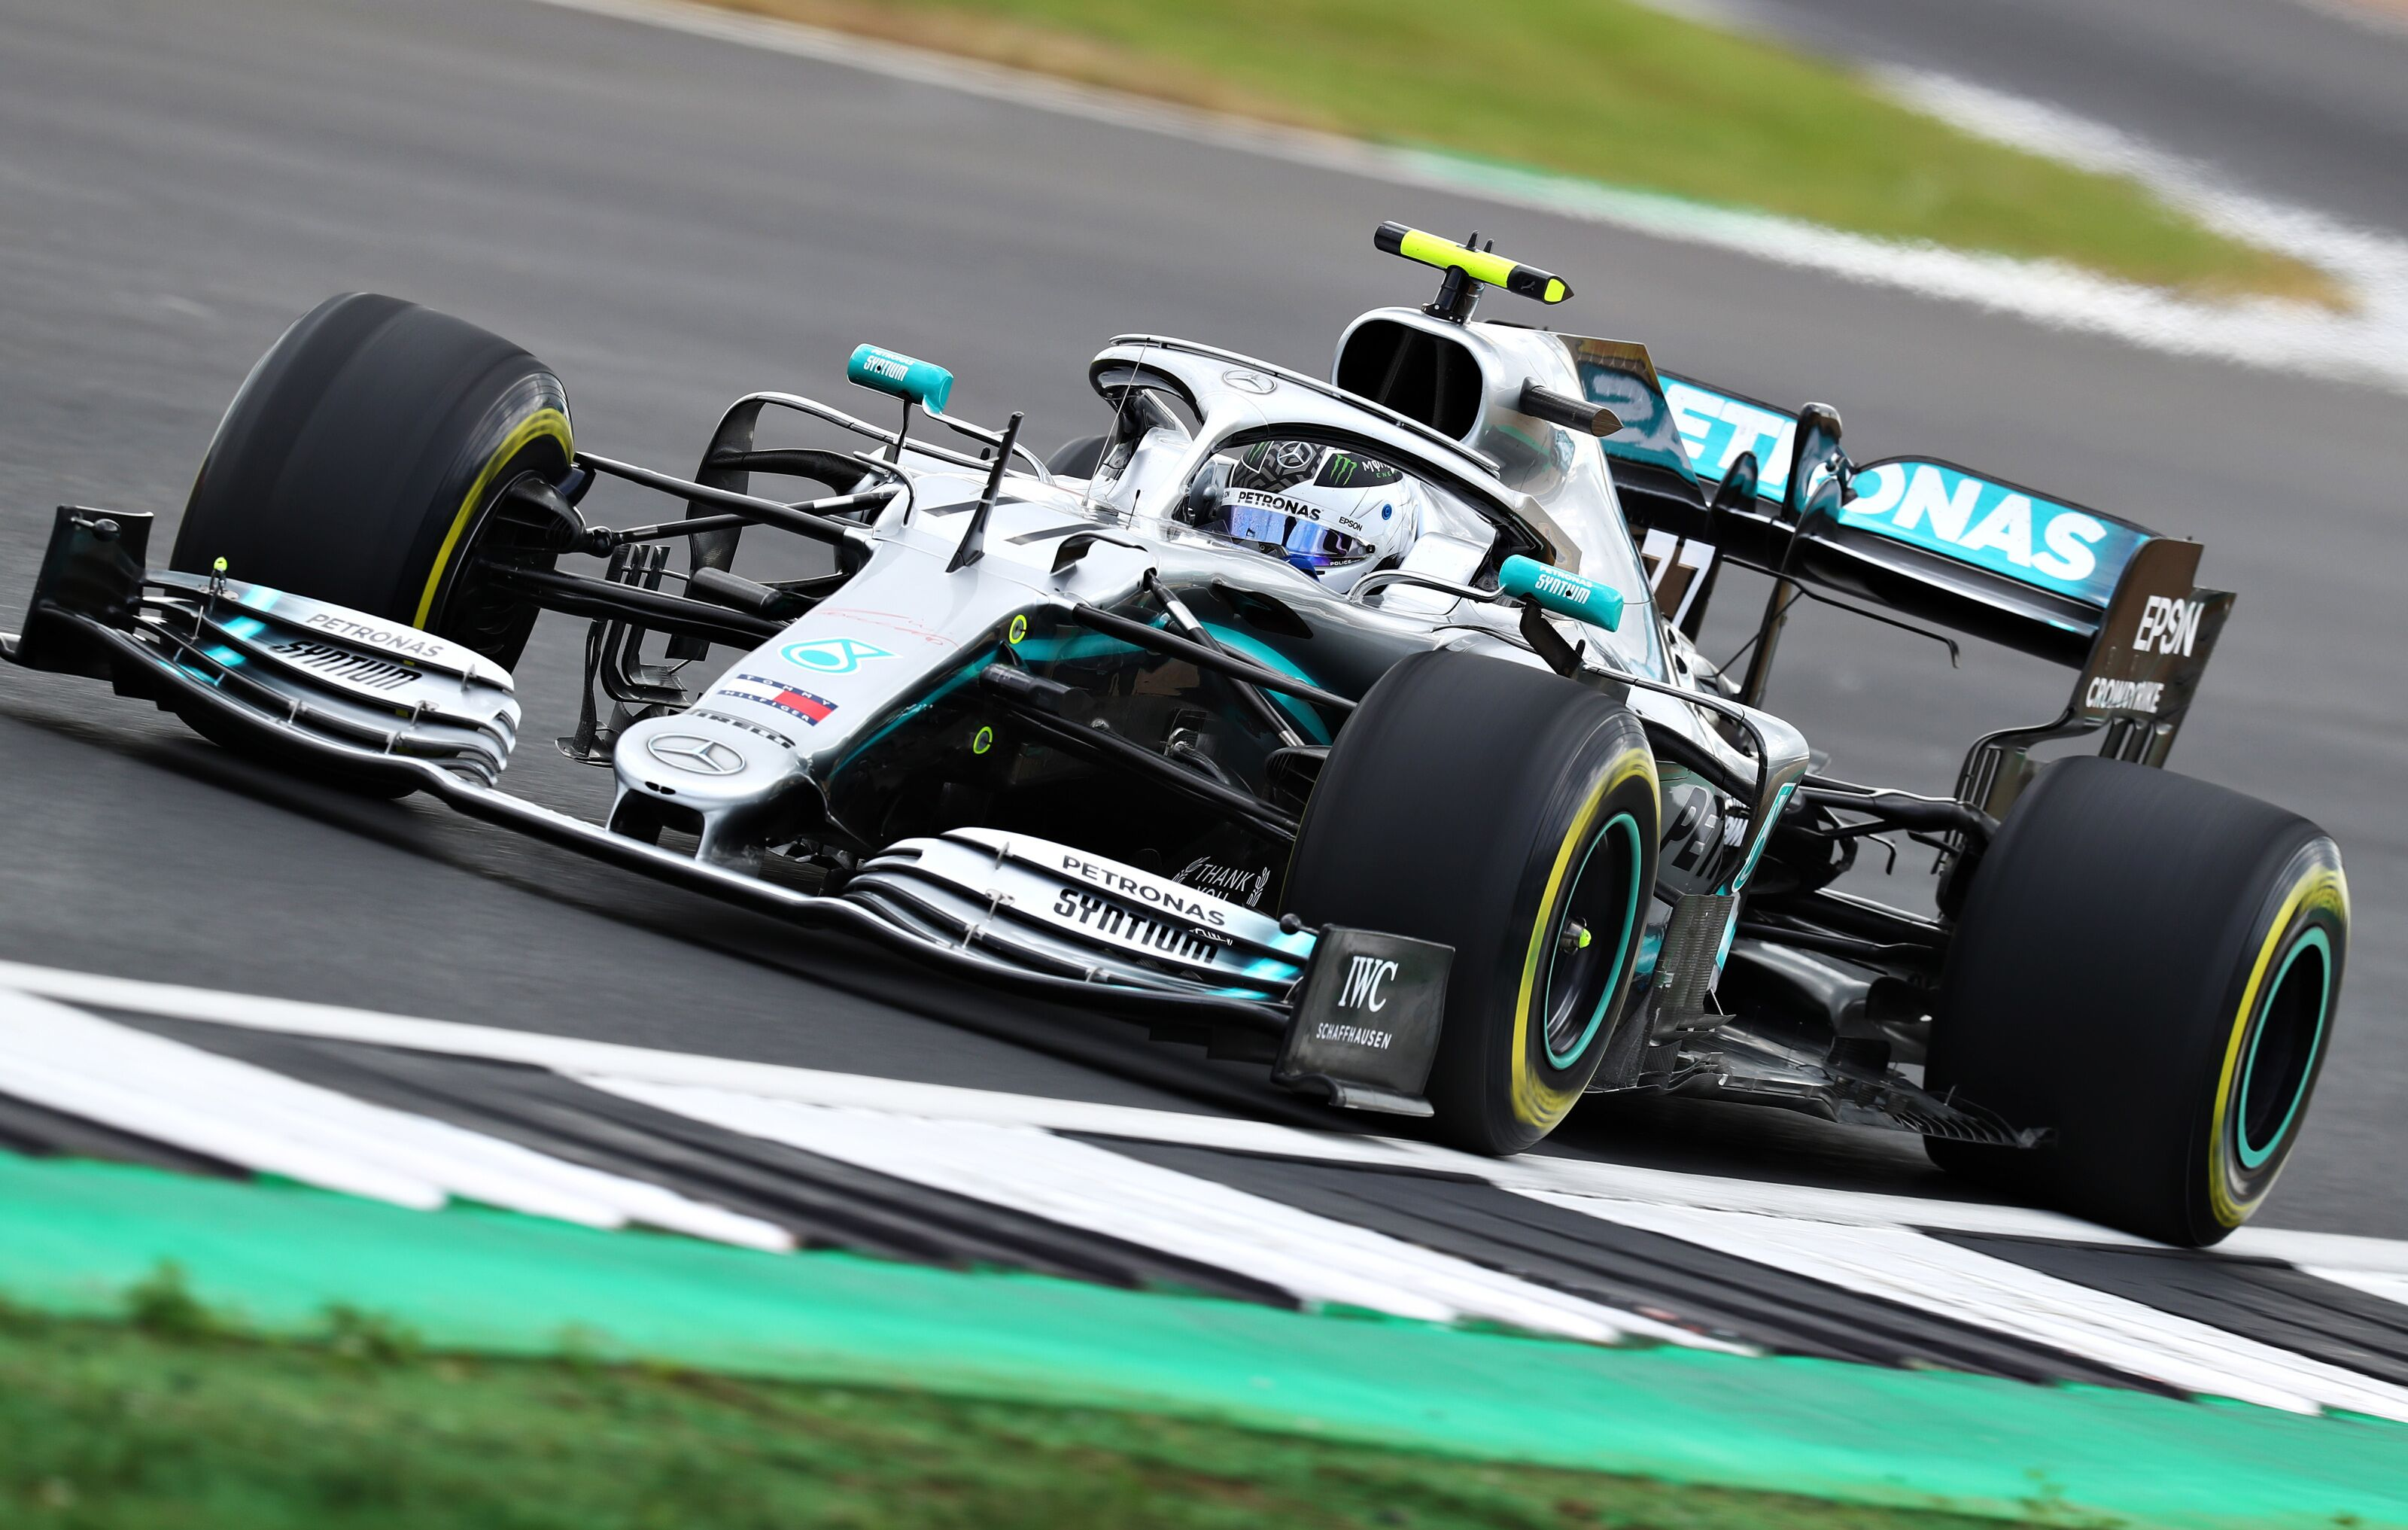 Formula 1: Valtteri Bottas takes pole for 2019 British Grand Prix